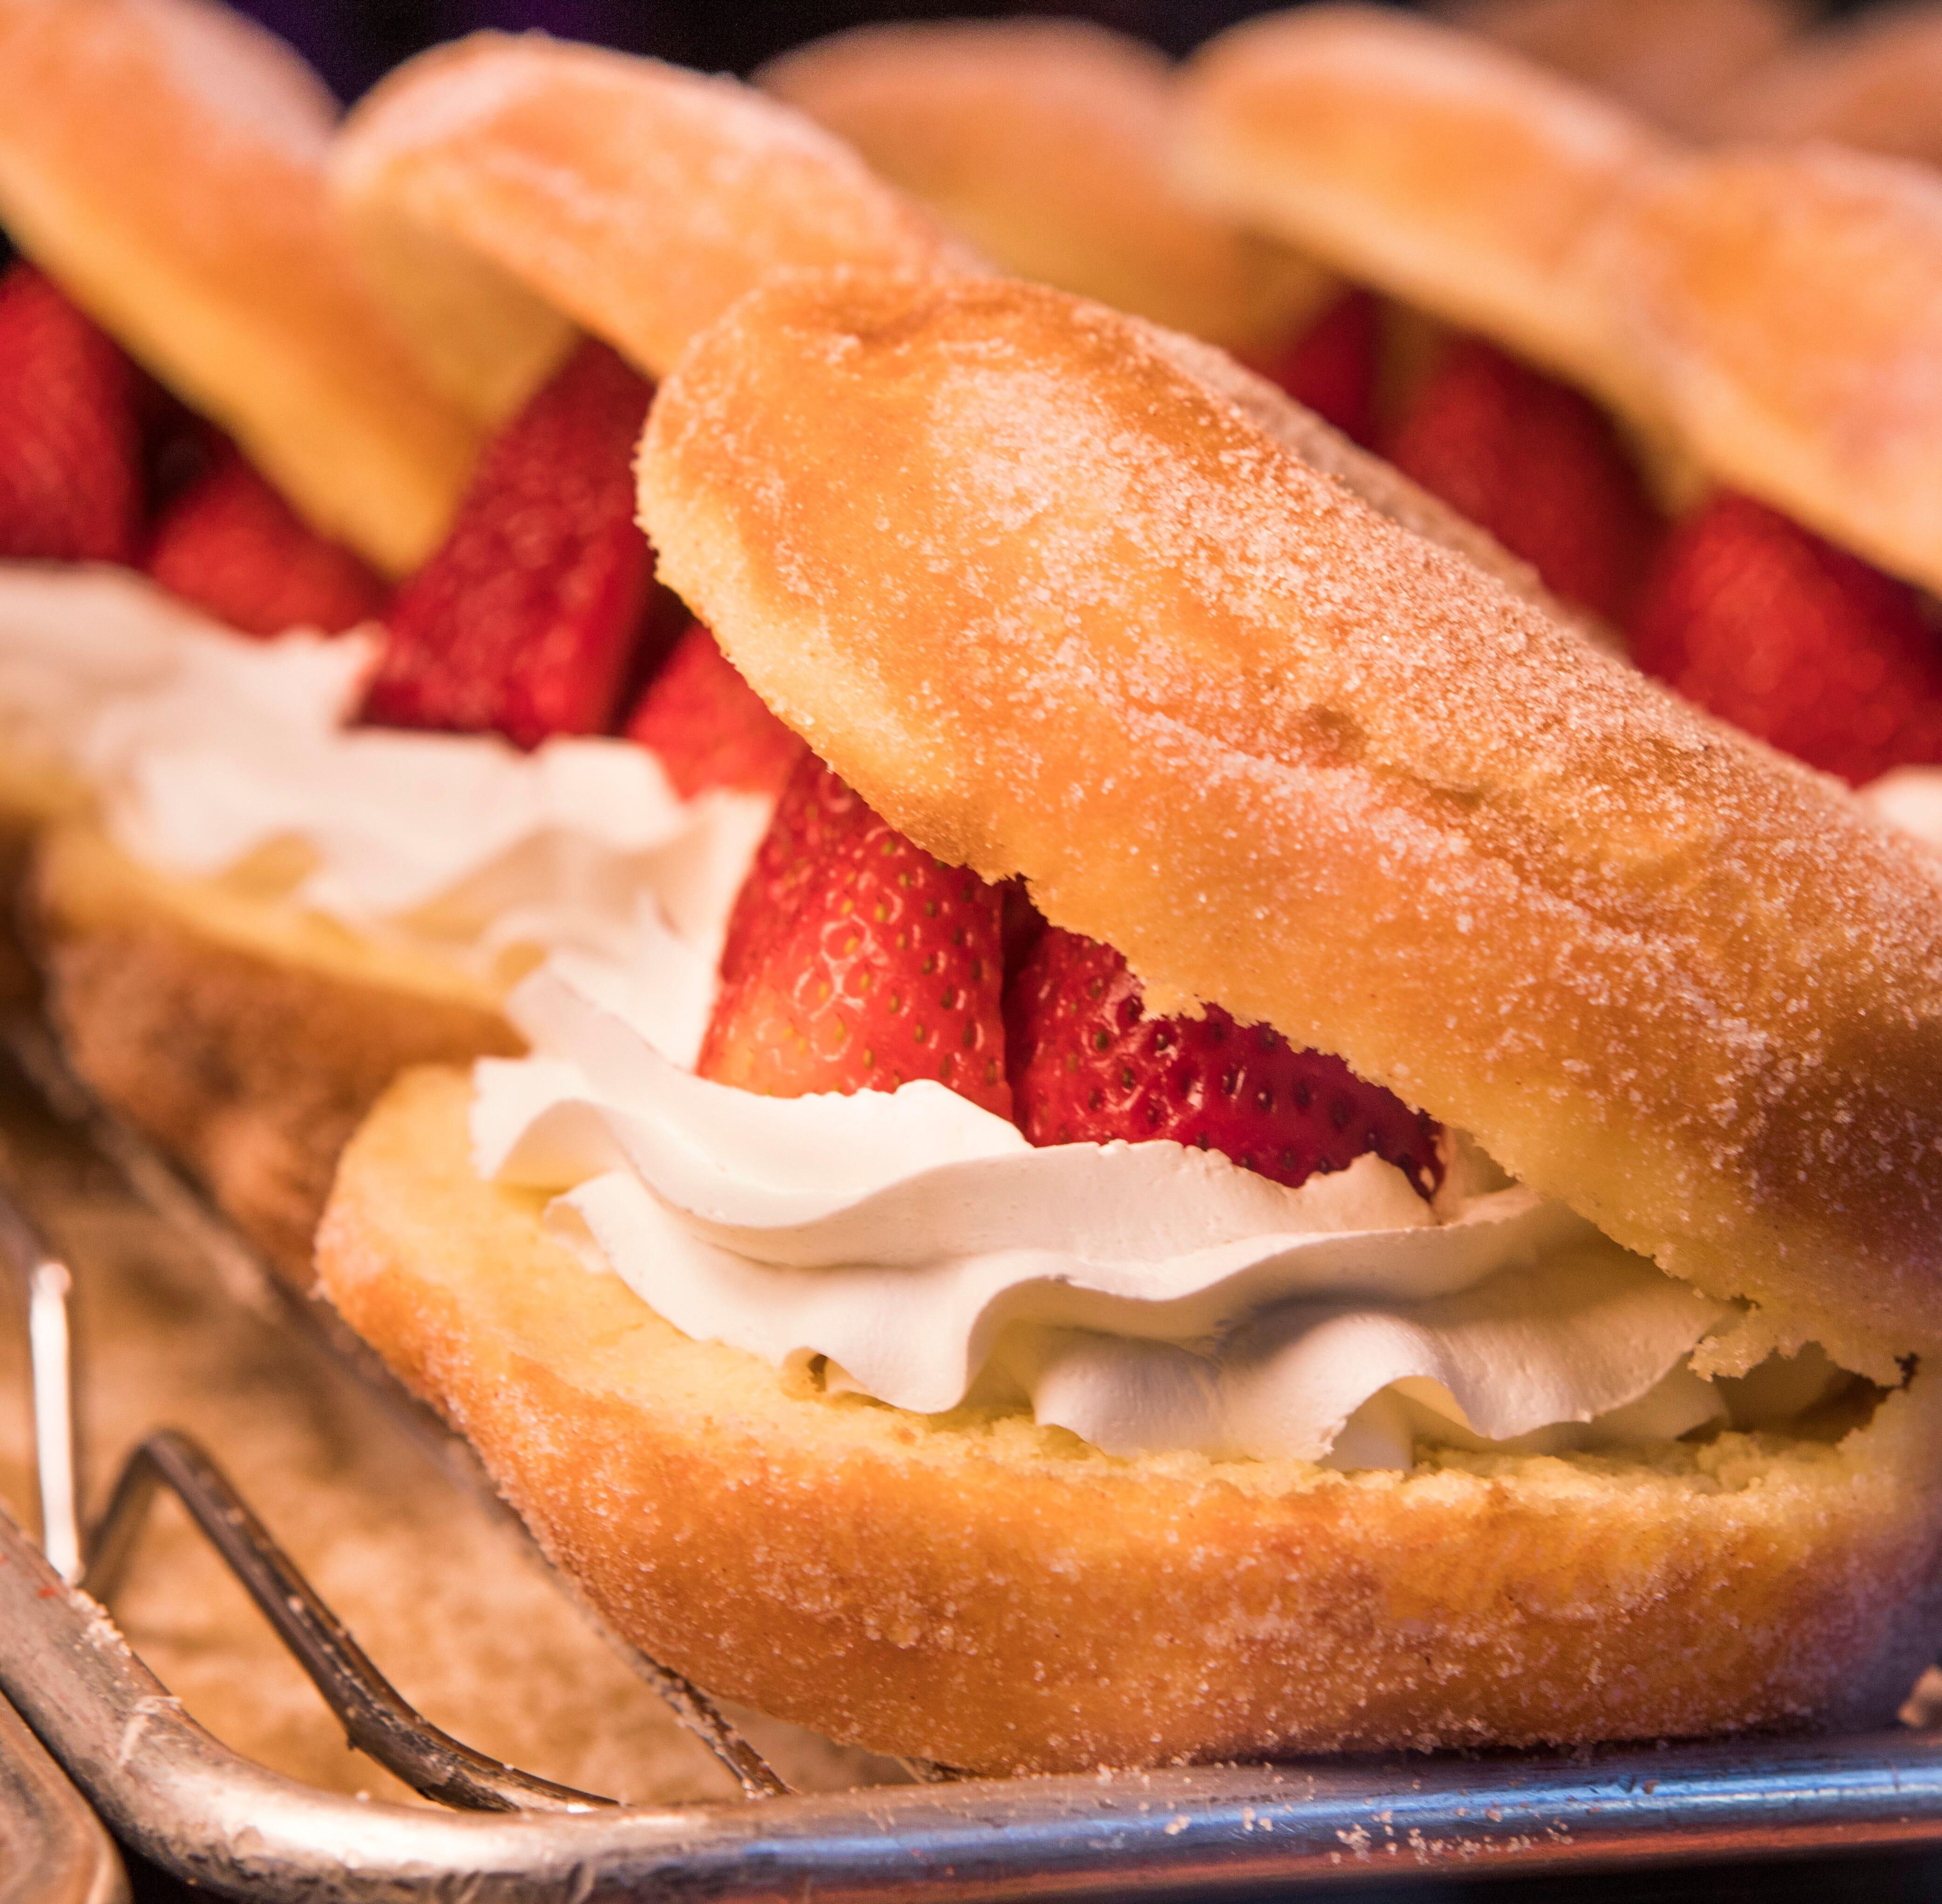 Donut Bar: Award-winning San Diego doughnut shop opens in Scottsdale